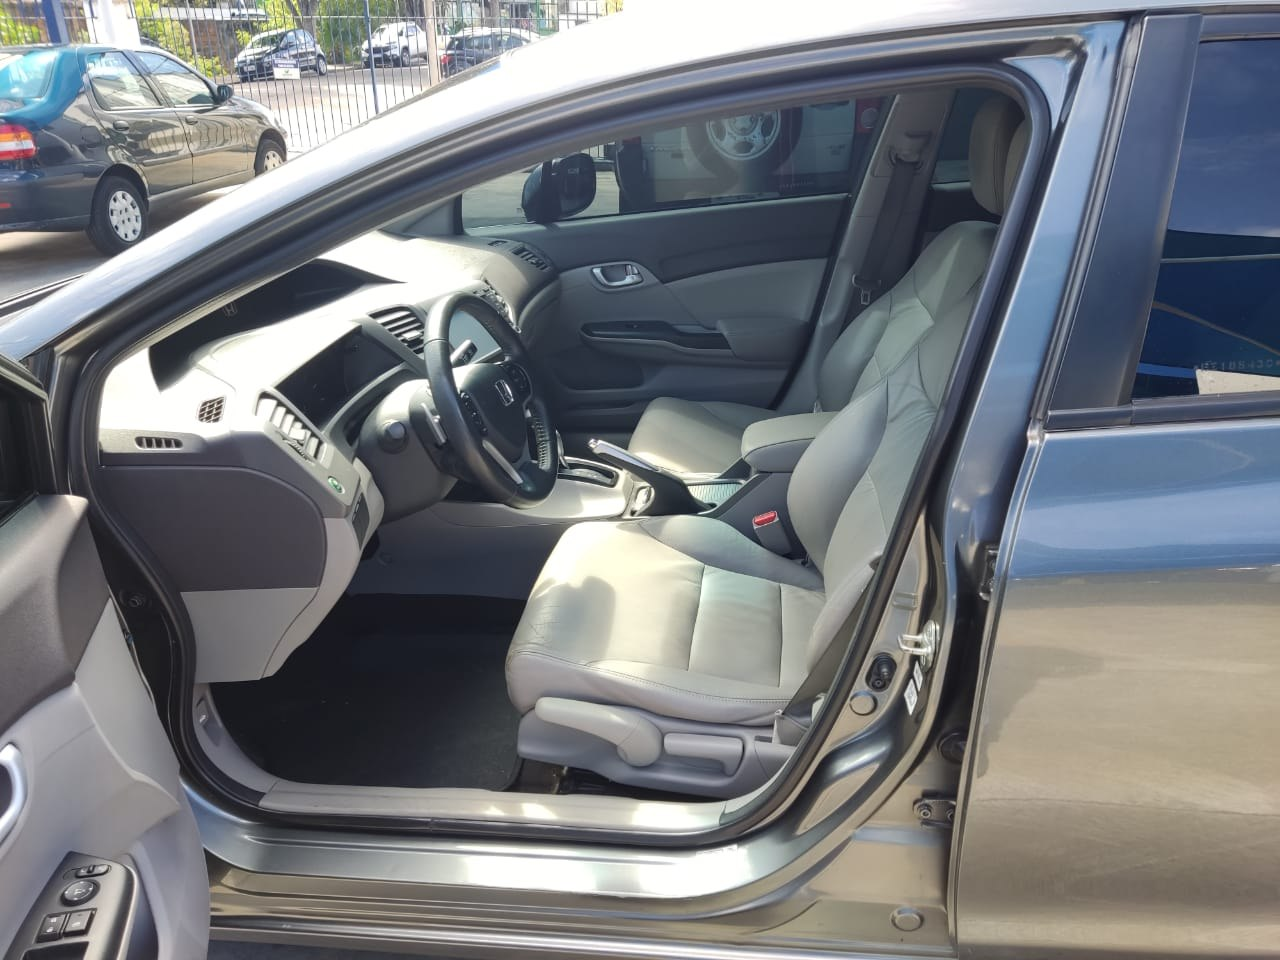 Civic 2.0 16V 4P FLEX LXR AUTOMÁTICO